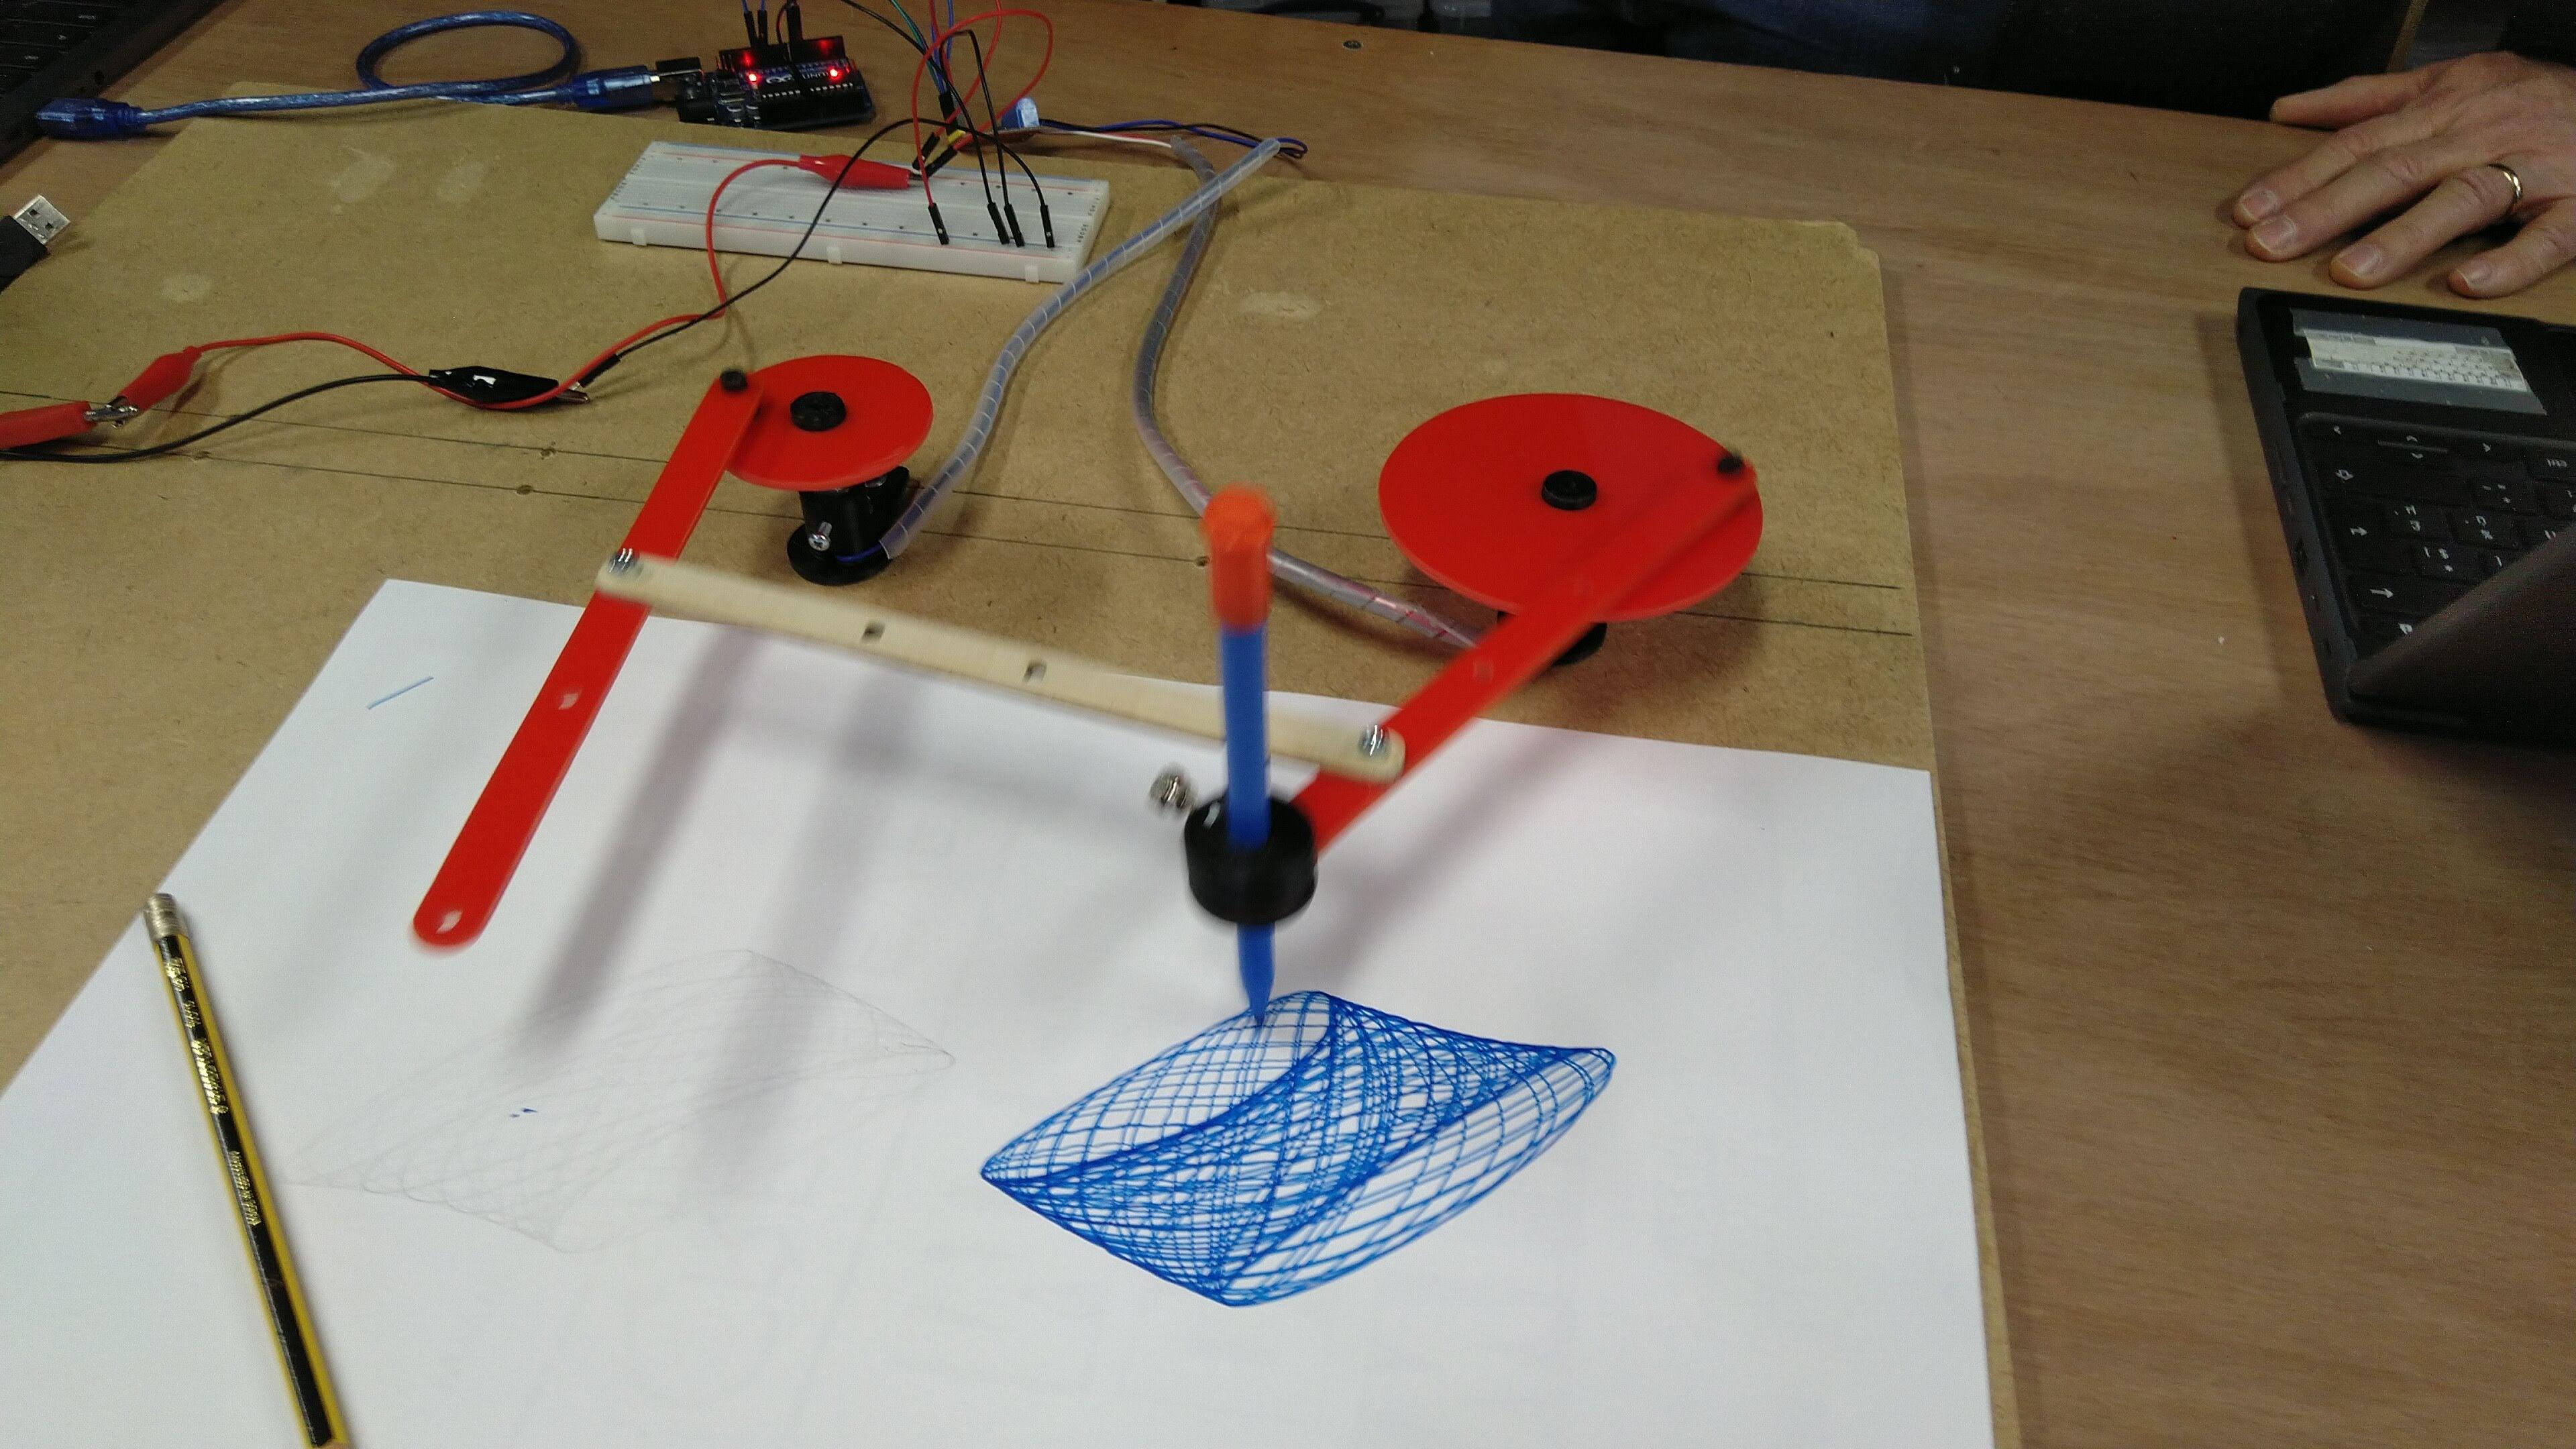 KerstKamp: Kids Build Machines, 9+, 2-3 Jan 2020